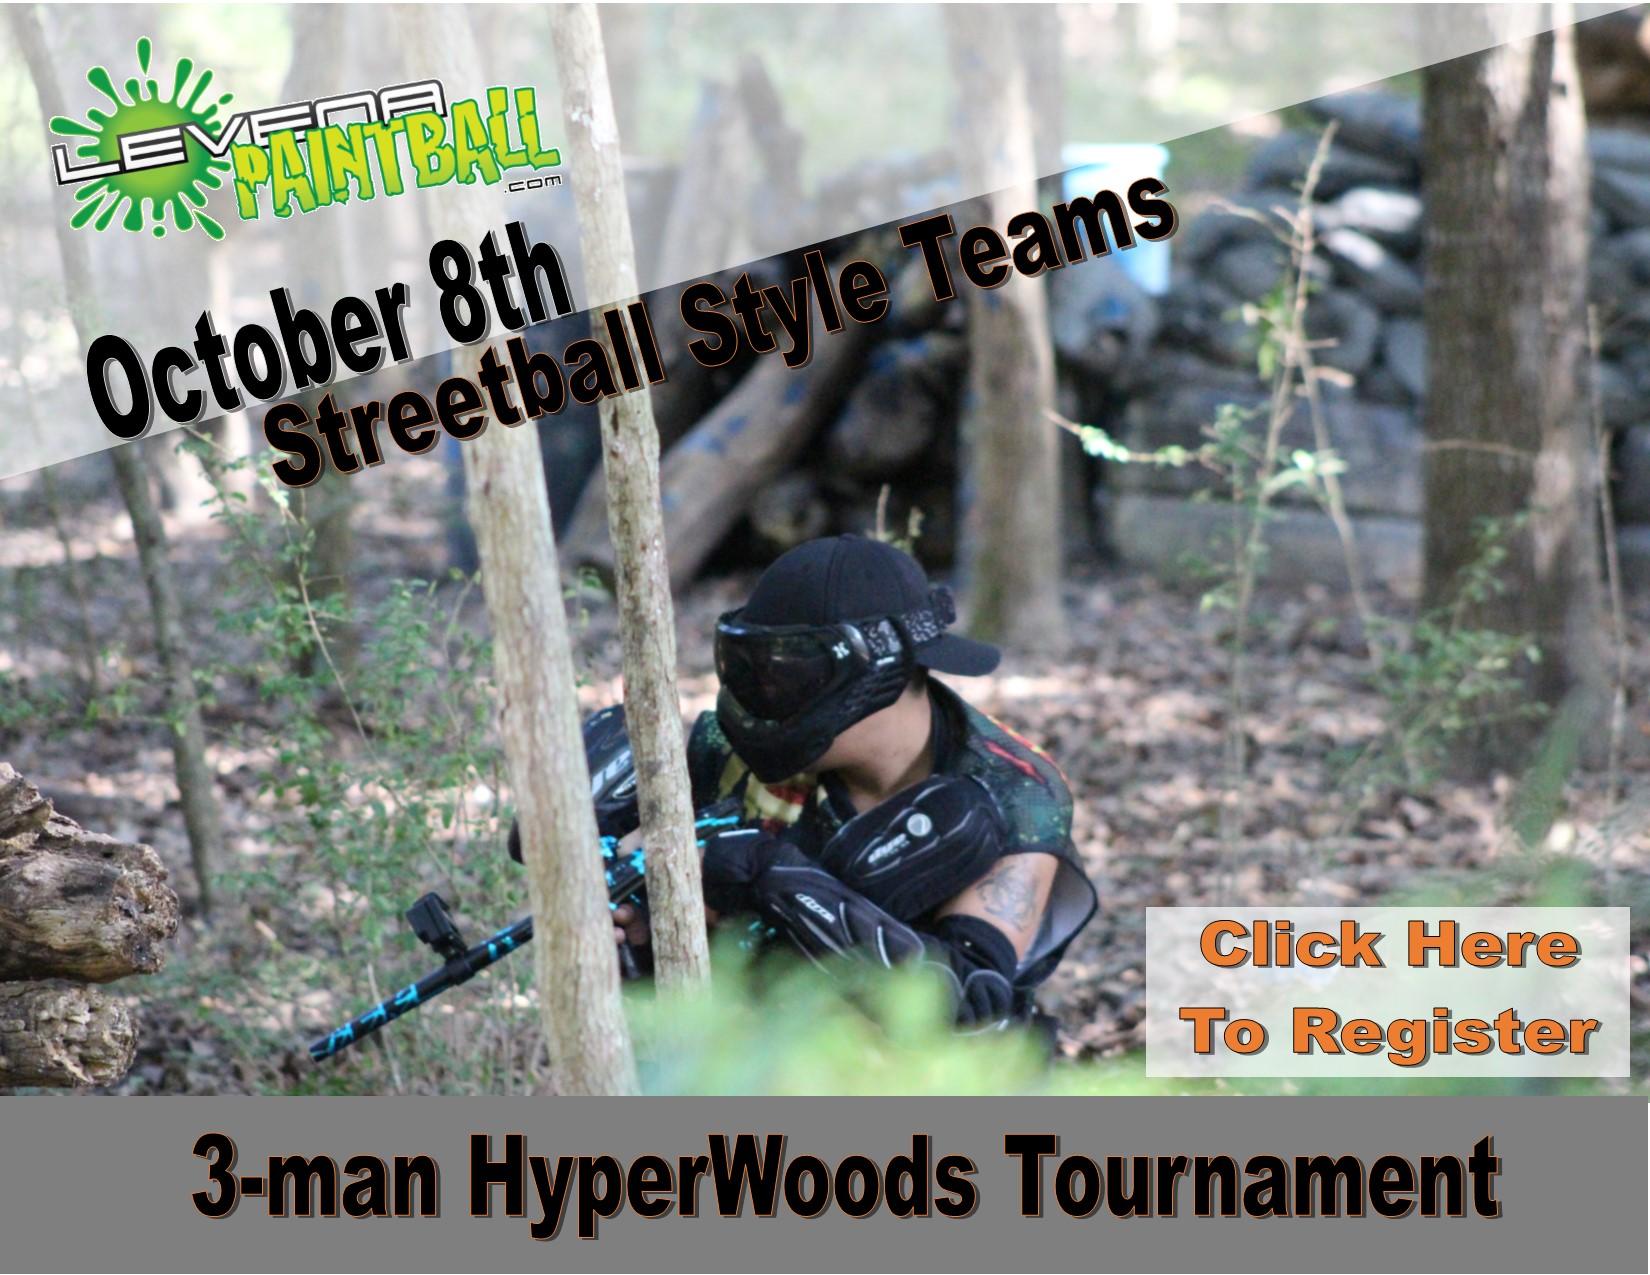 Hyperwoods